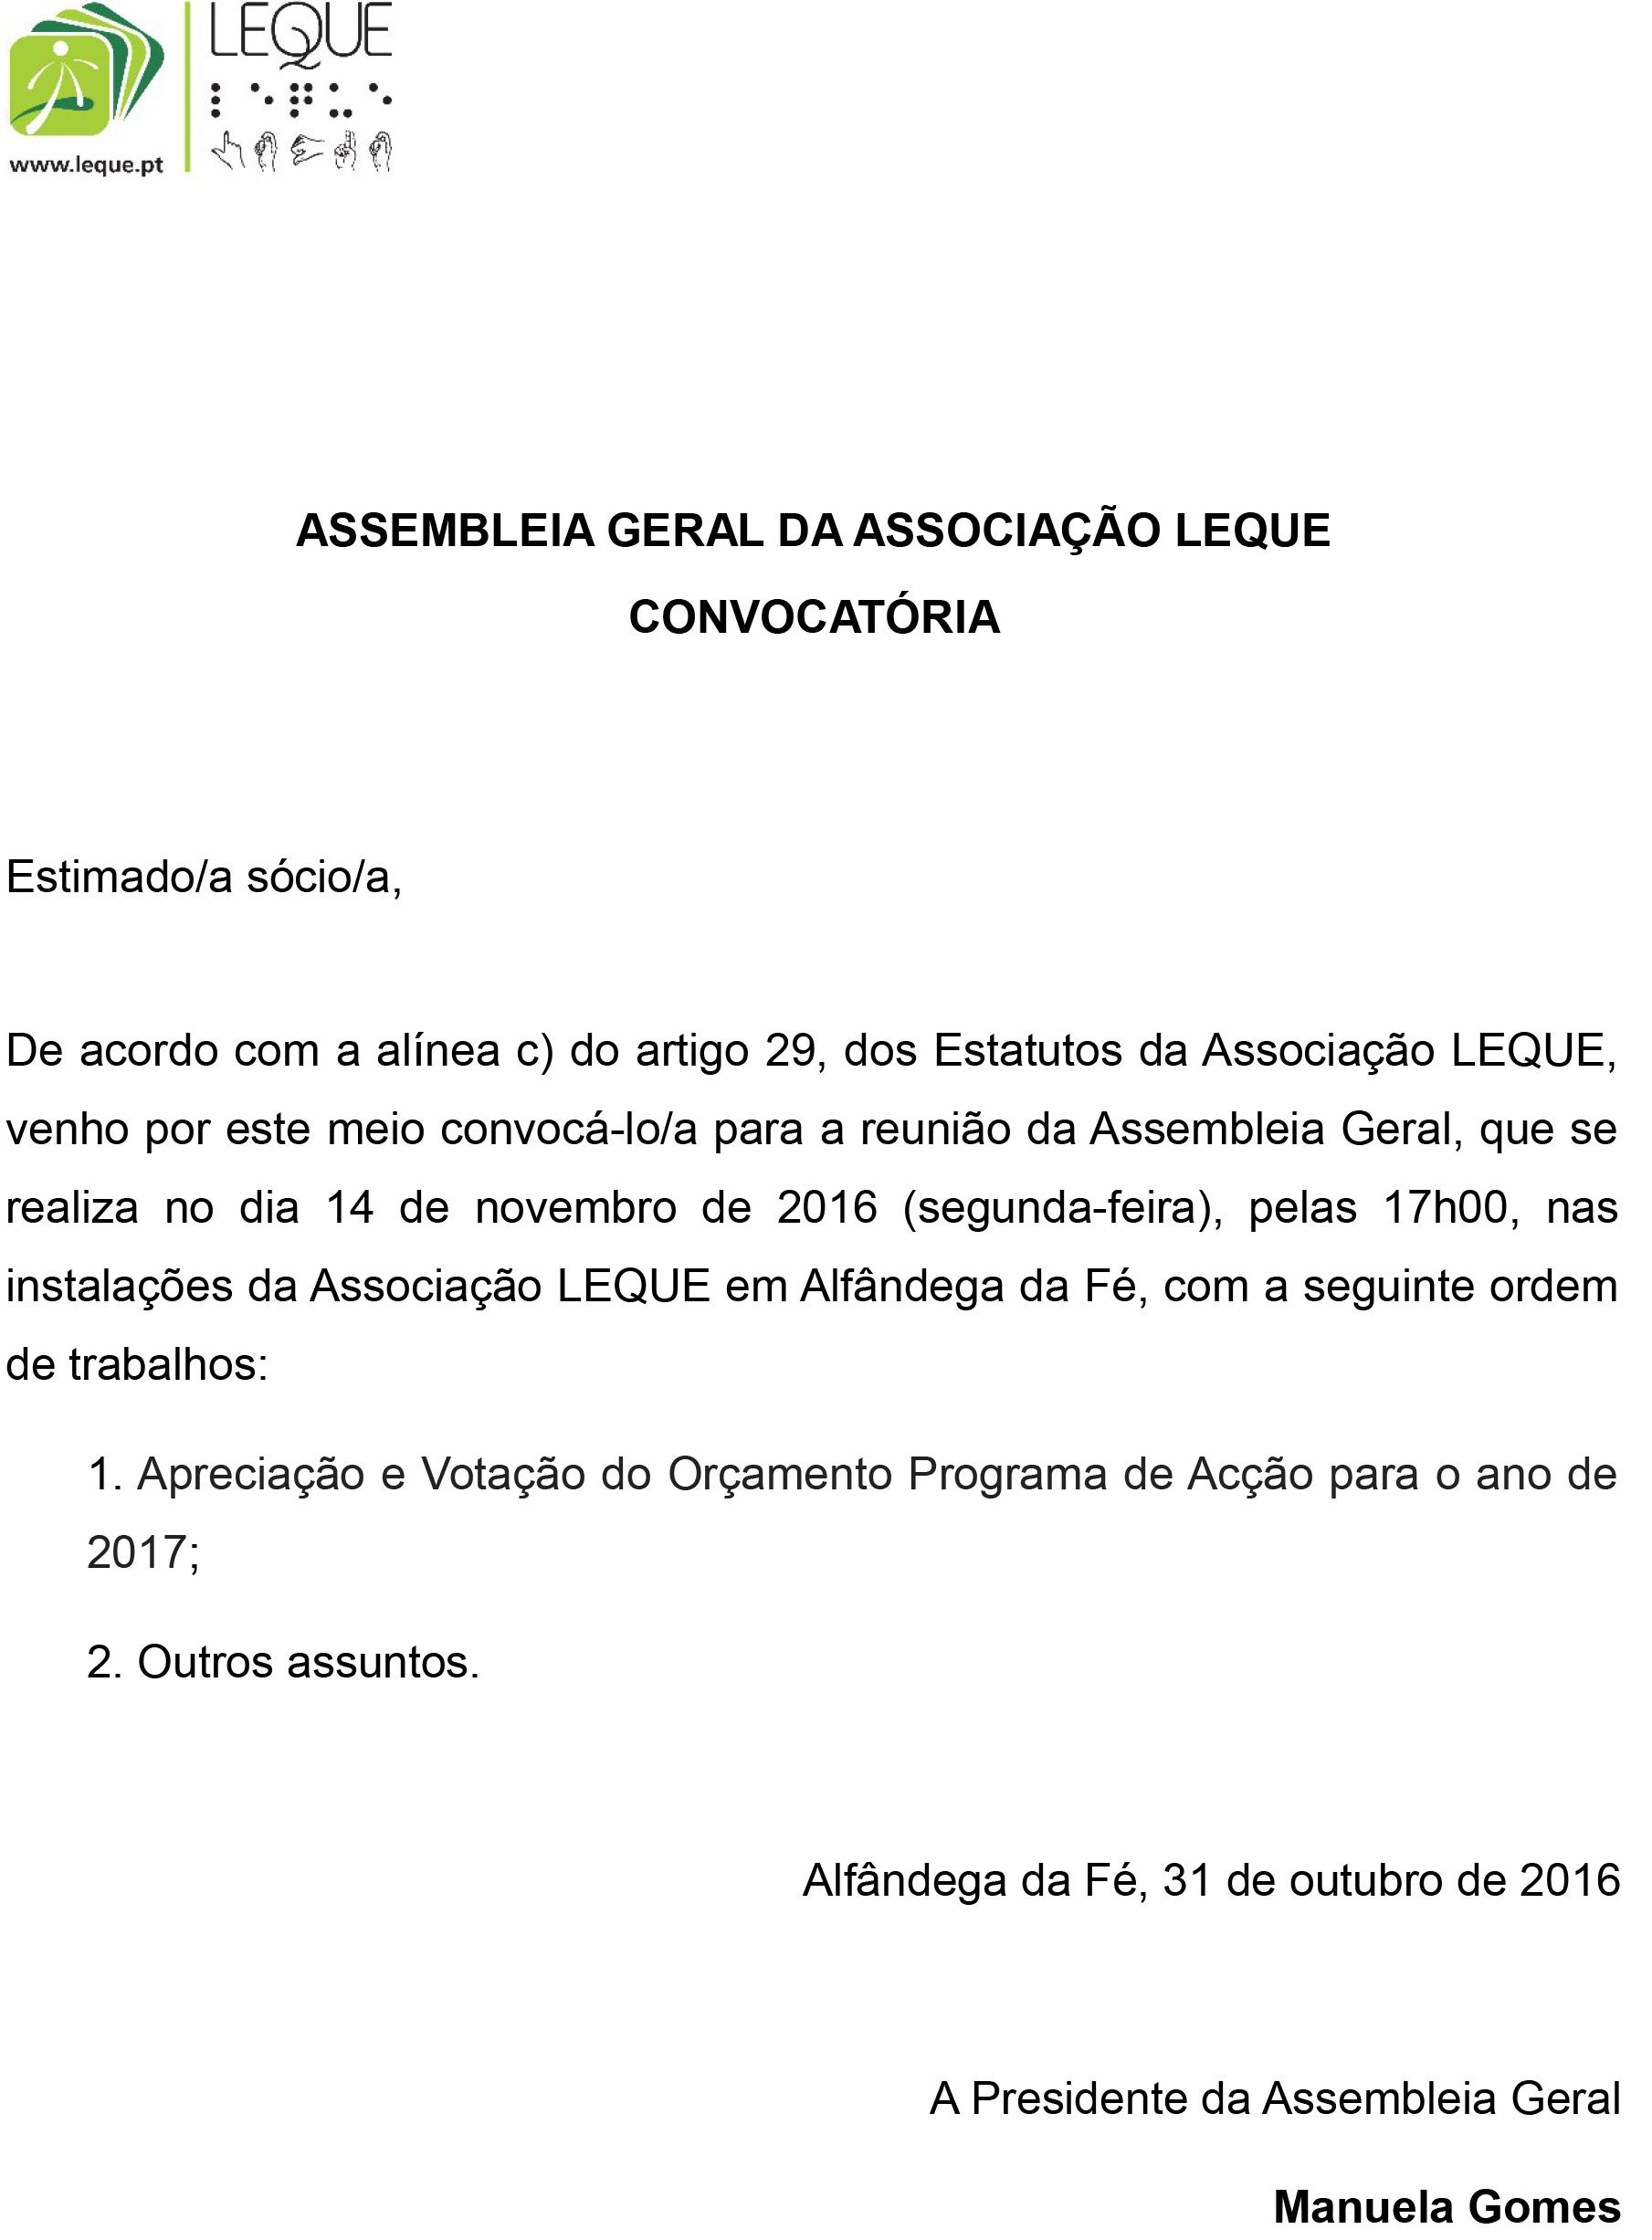 convocatoria-assembleia-geral-14-de-novembro-2016